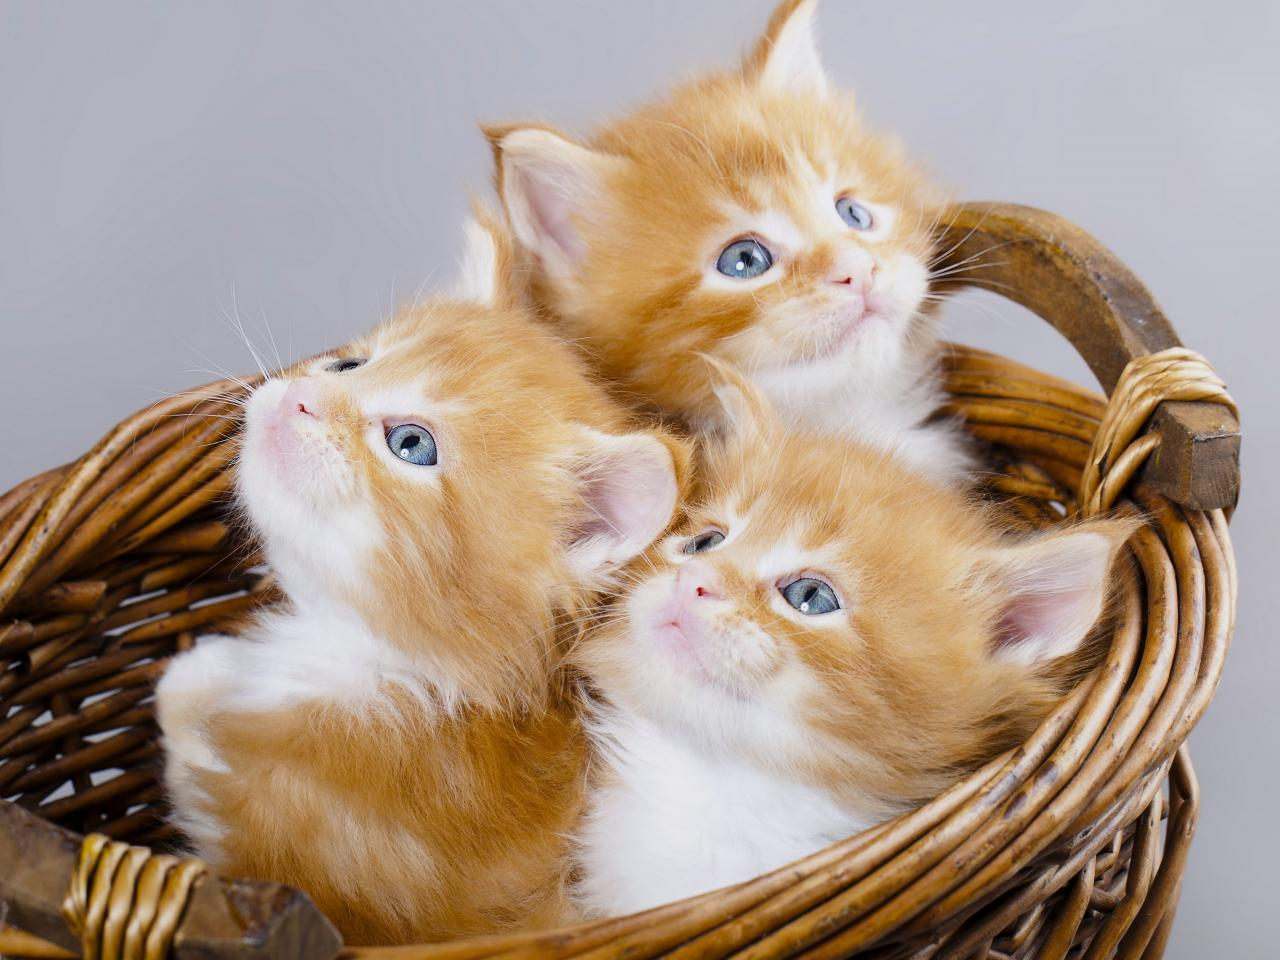 بالصور صور قطط متحركة , صور قطط كيوت 6317 3